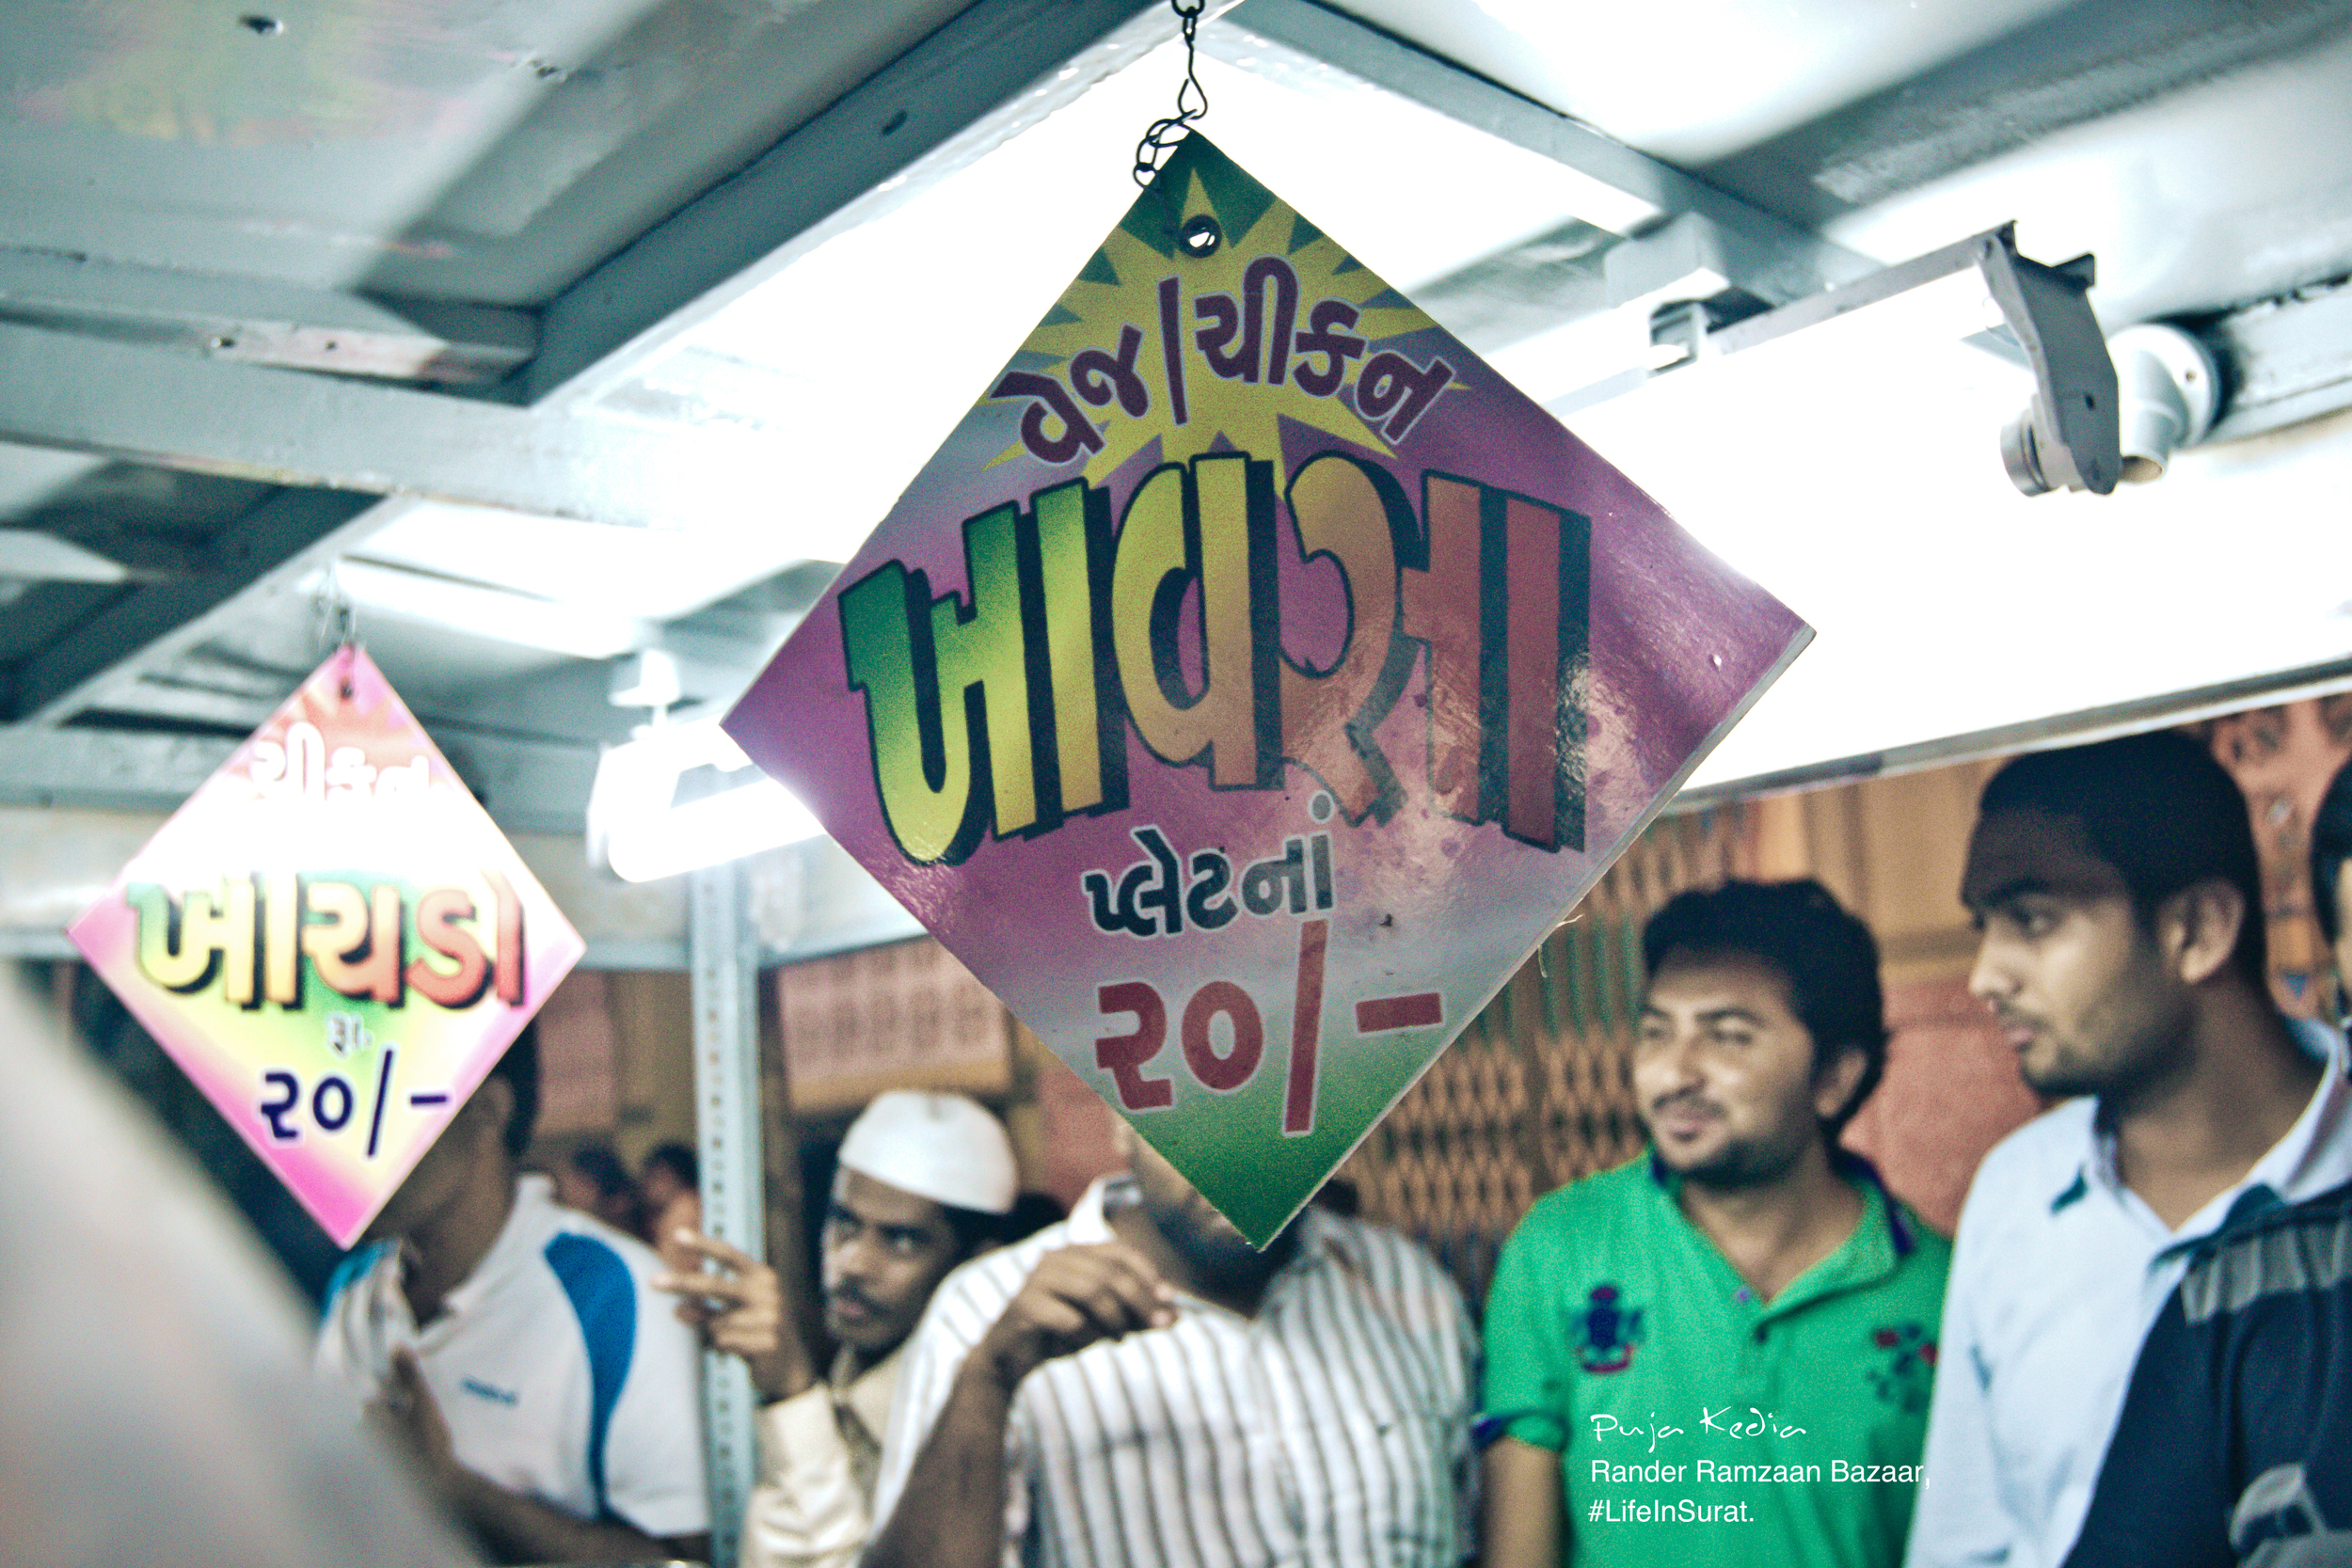 Rander Ramzaan Bazaar